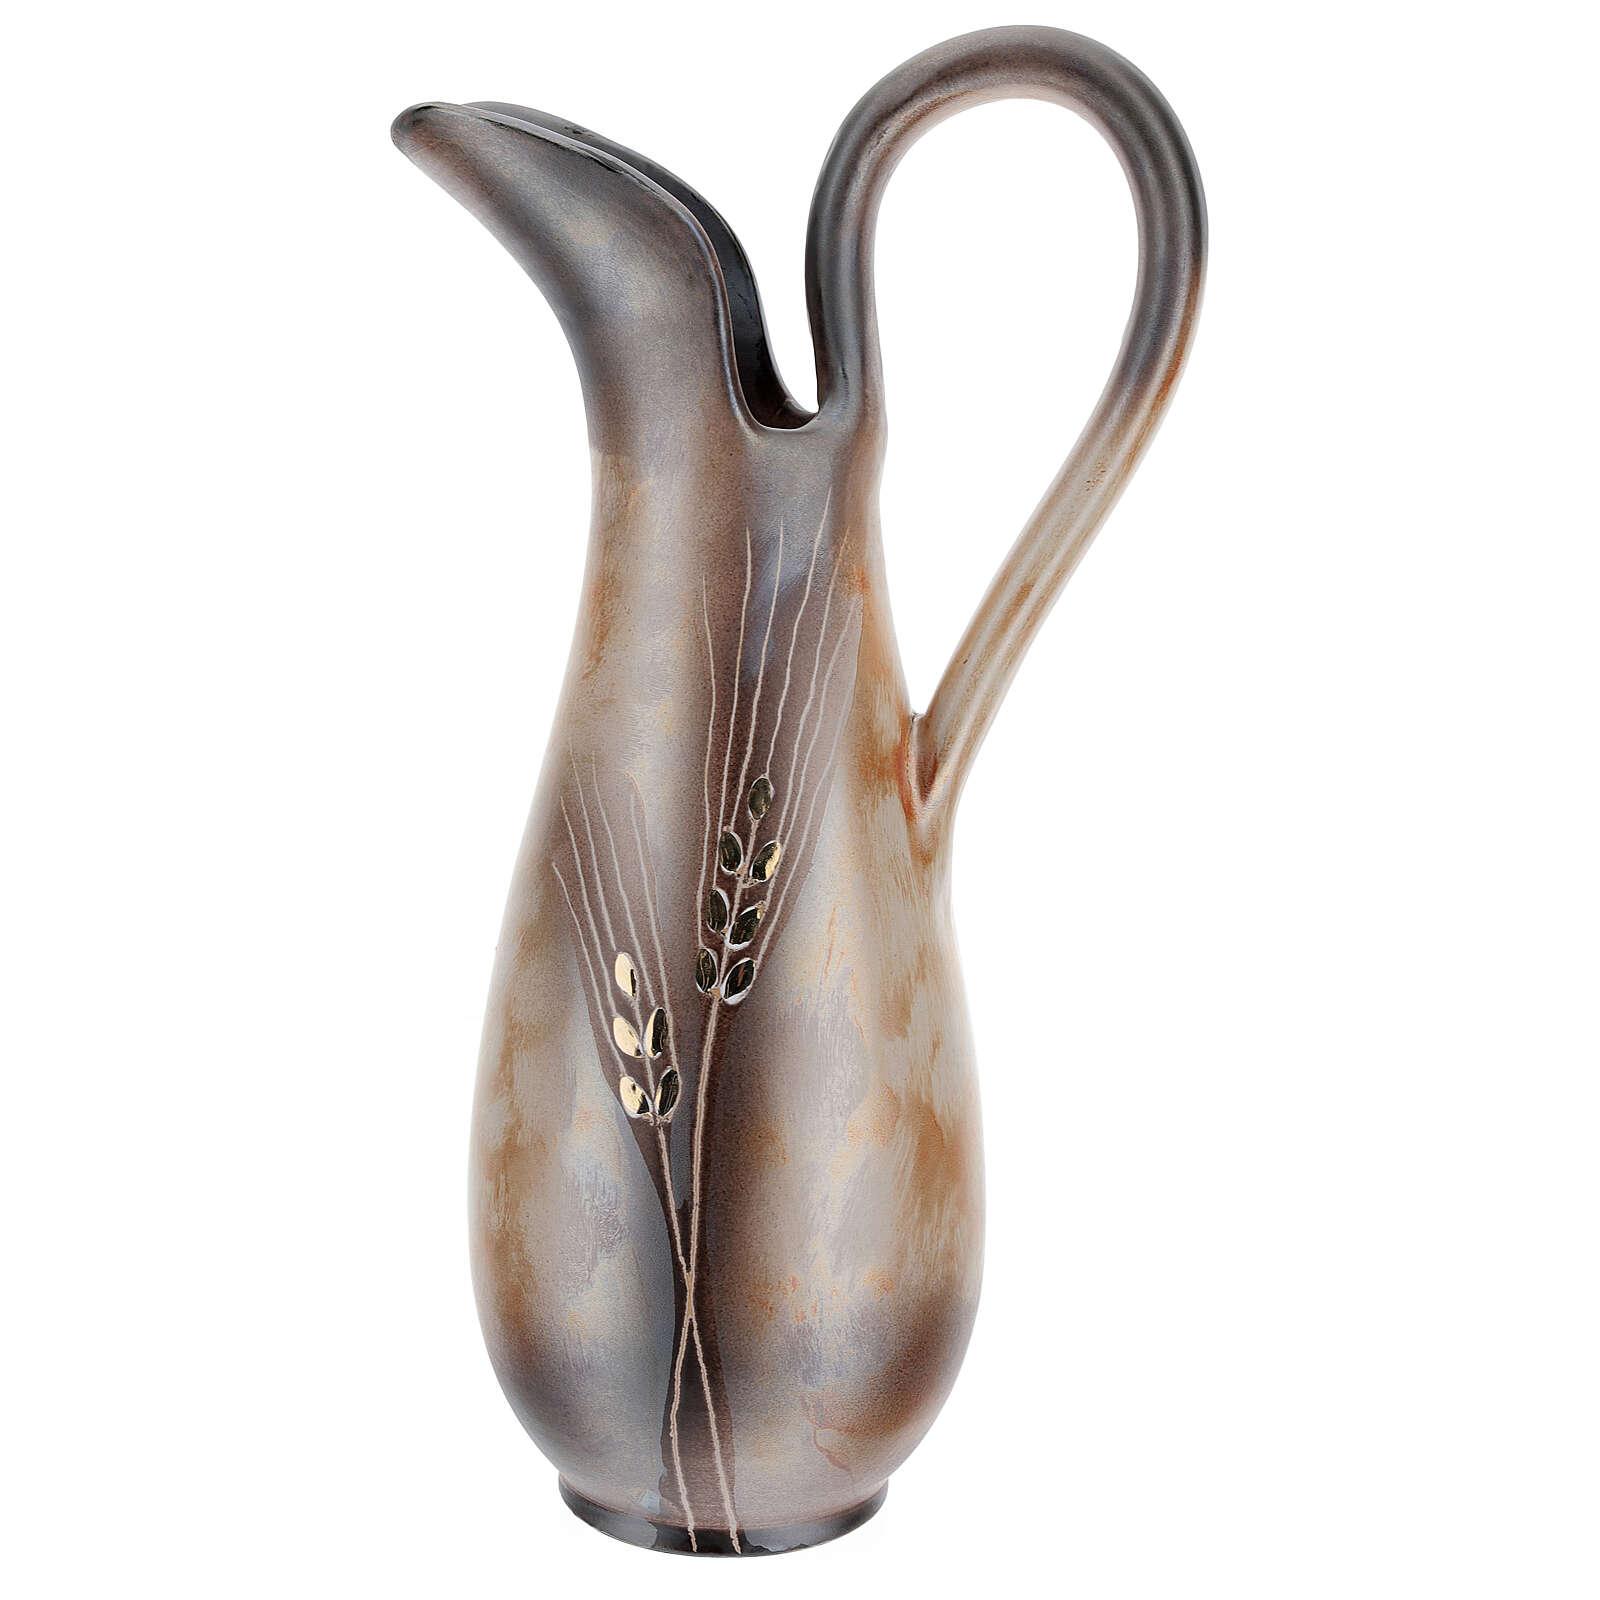 STOCK Jarra cerámica Pompeya motivo espiga dorada h. 32 cm 3